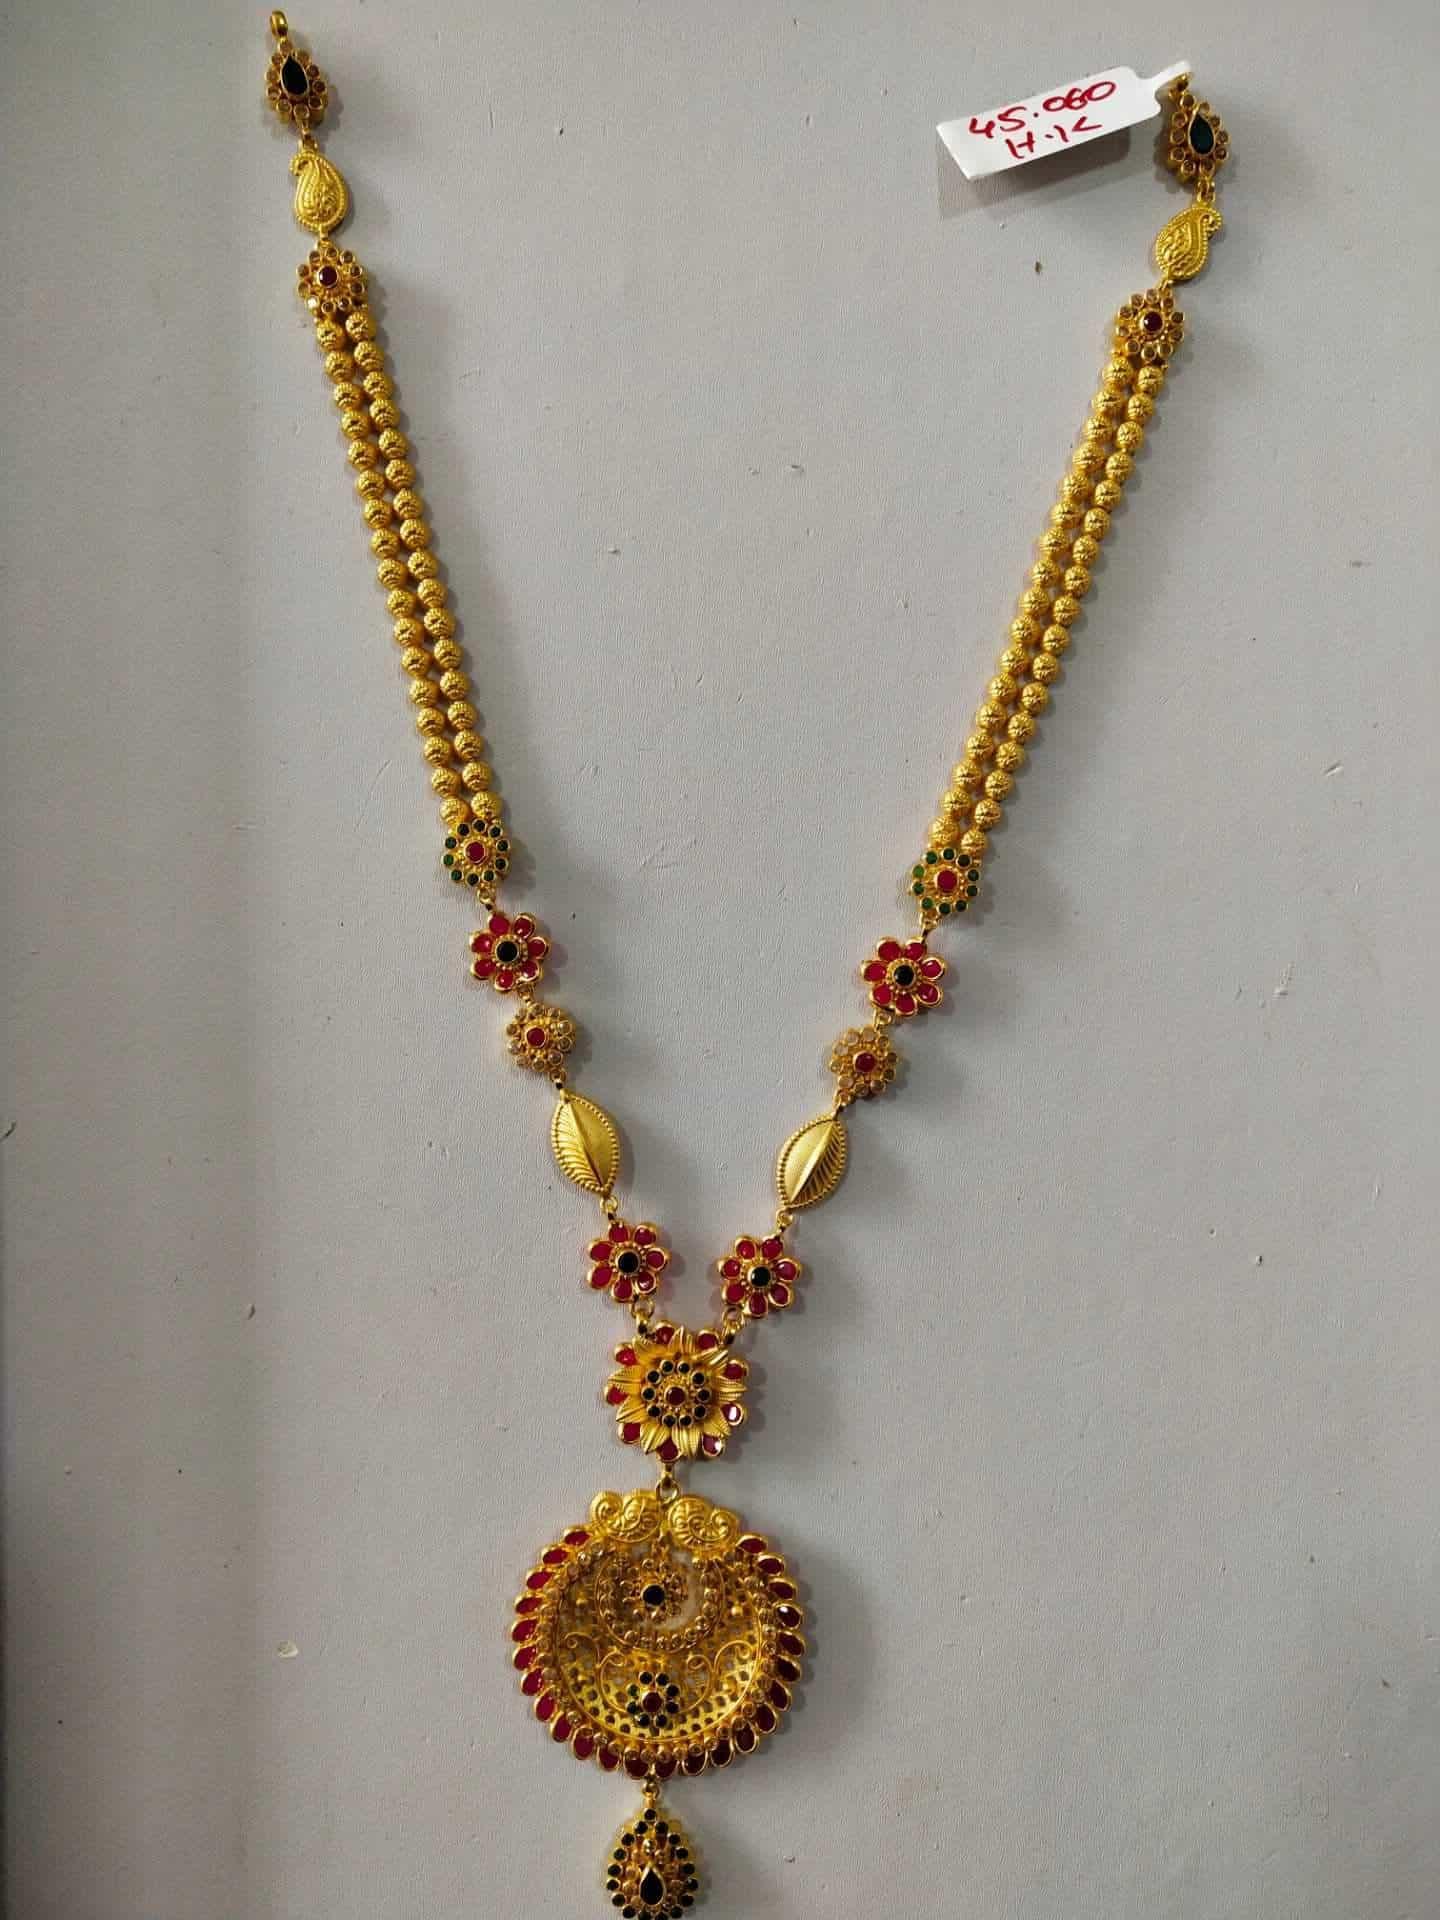 0f2452ca2 Jangala Jewellery, Besides Andhra Bank - Jewellery Showrooms in  Machilipatnam - Justdial